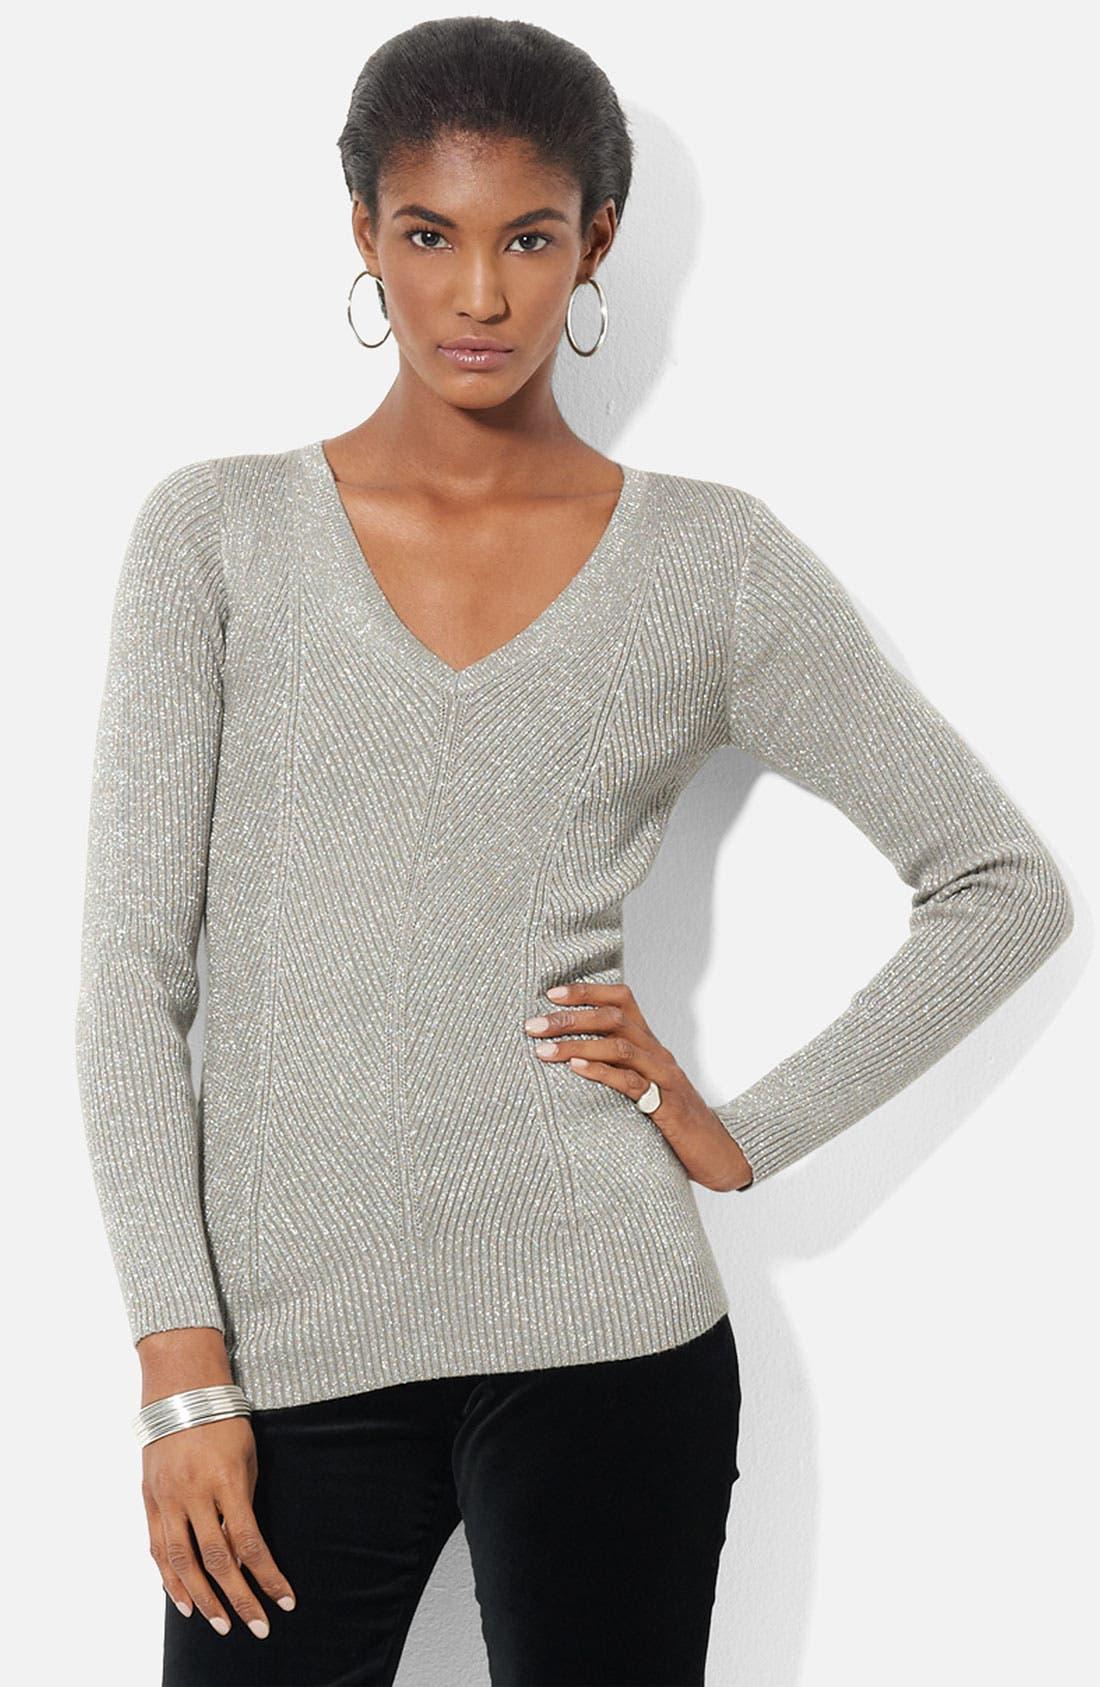 Alternate Image 1 Selected - Lauren Ralph Lauren V-Neck Metallic Knit Sweater (Petite)